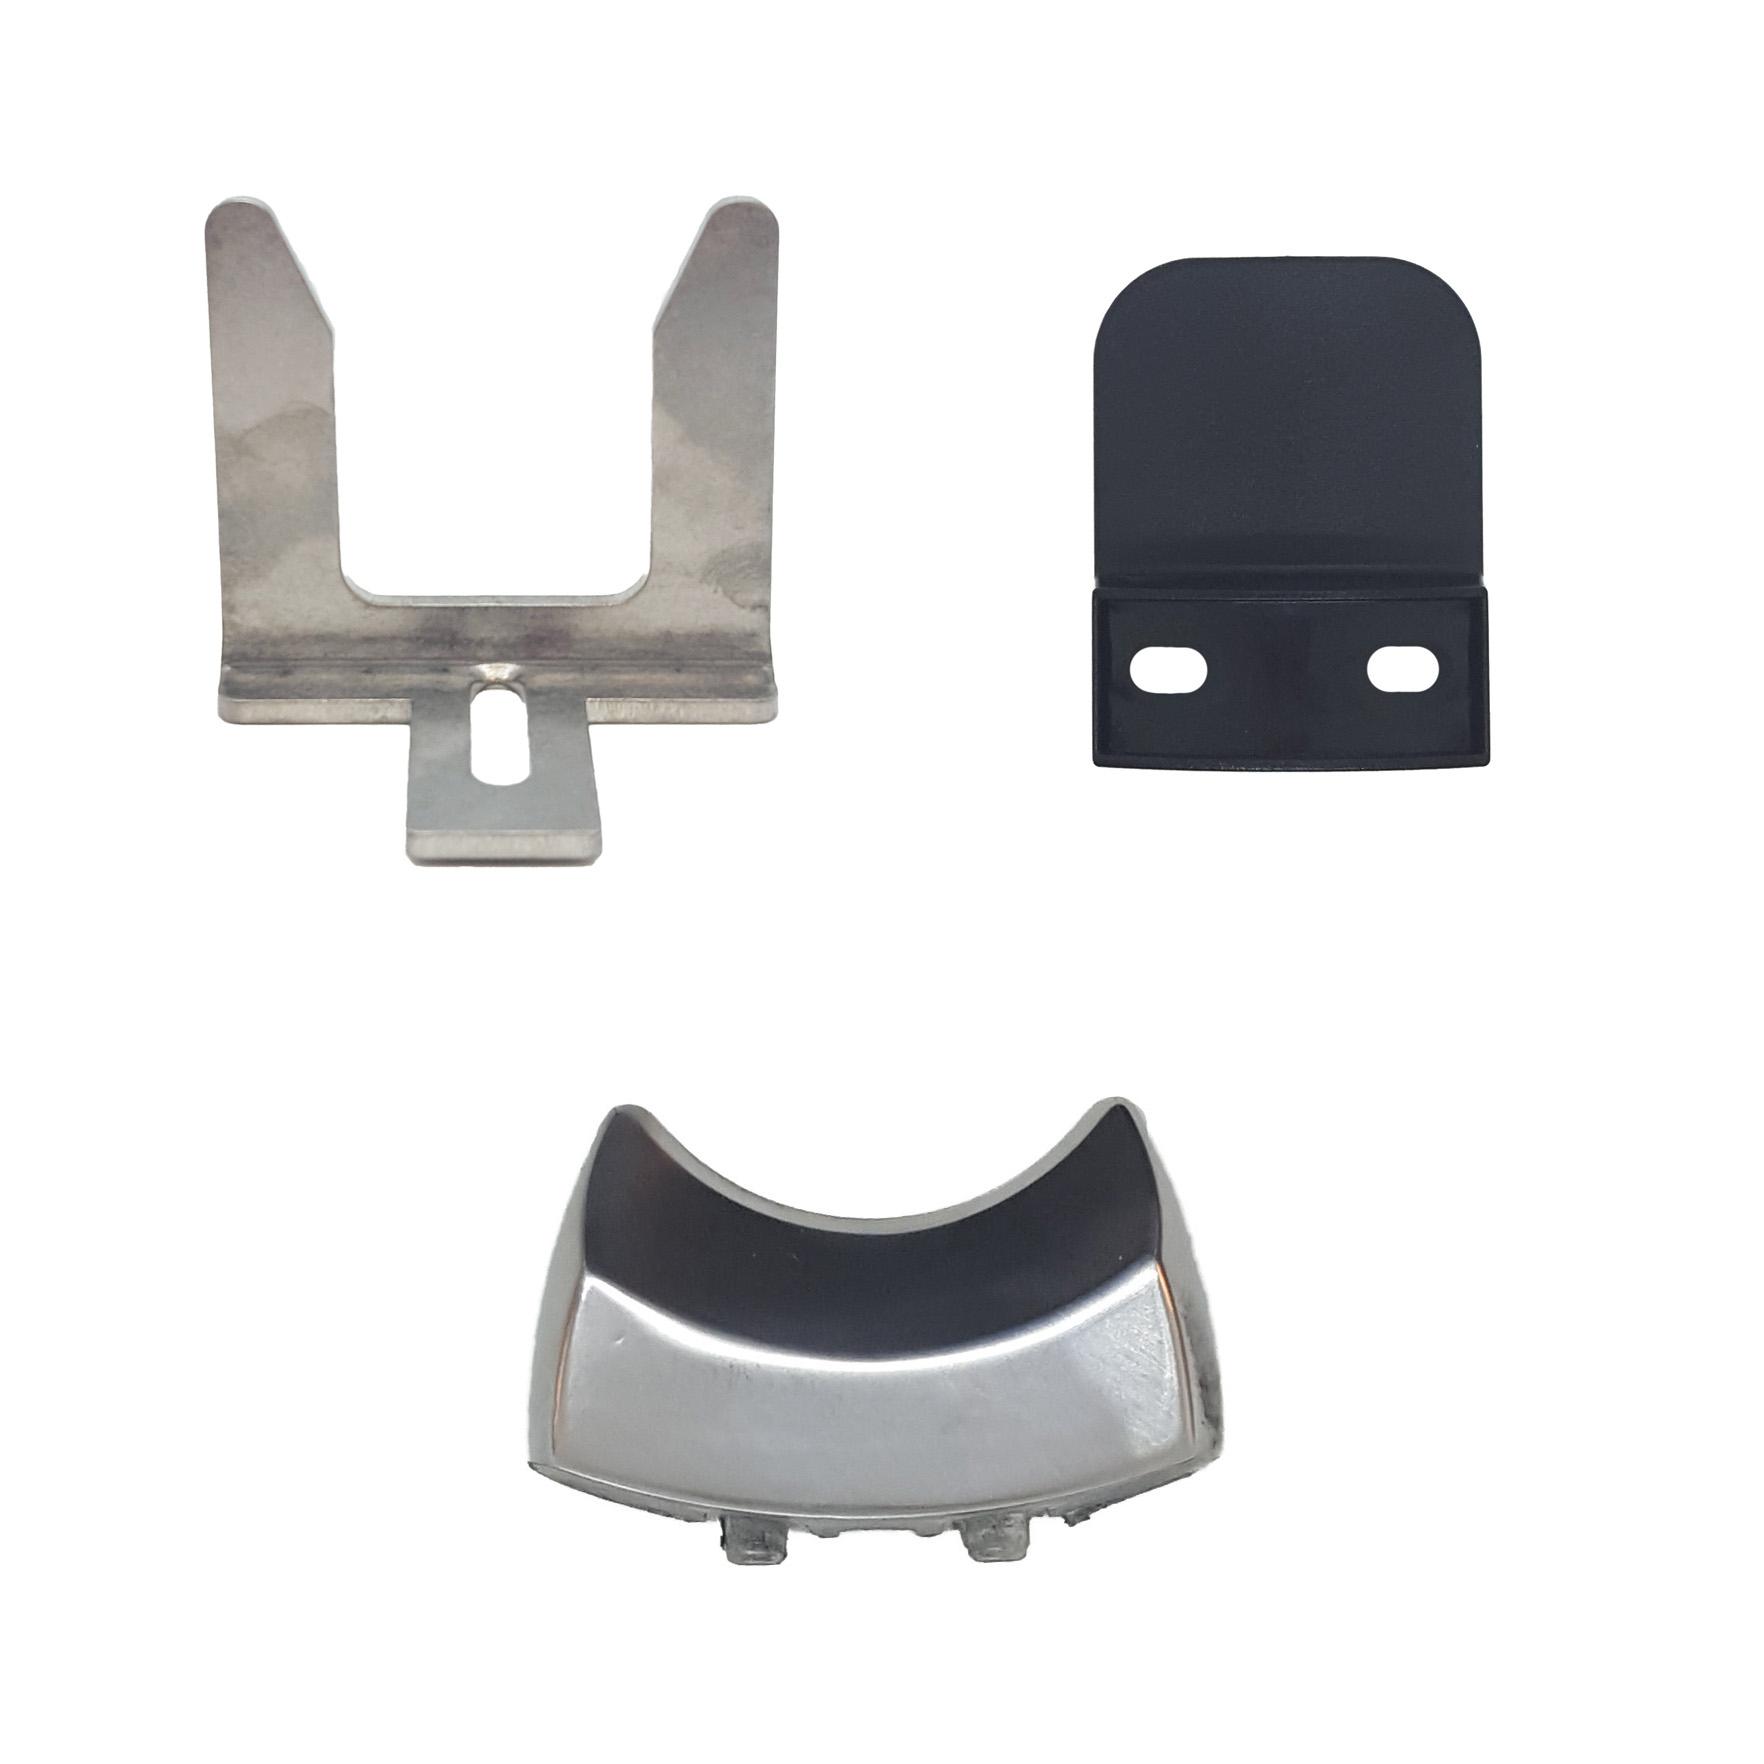 Fiorenzato Universal Portafilter Fork w/ Spacer & Hook